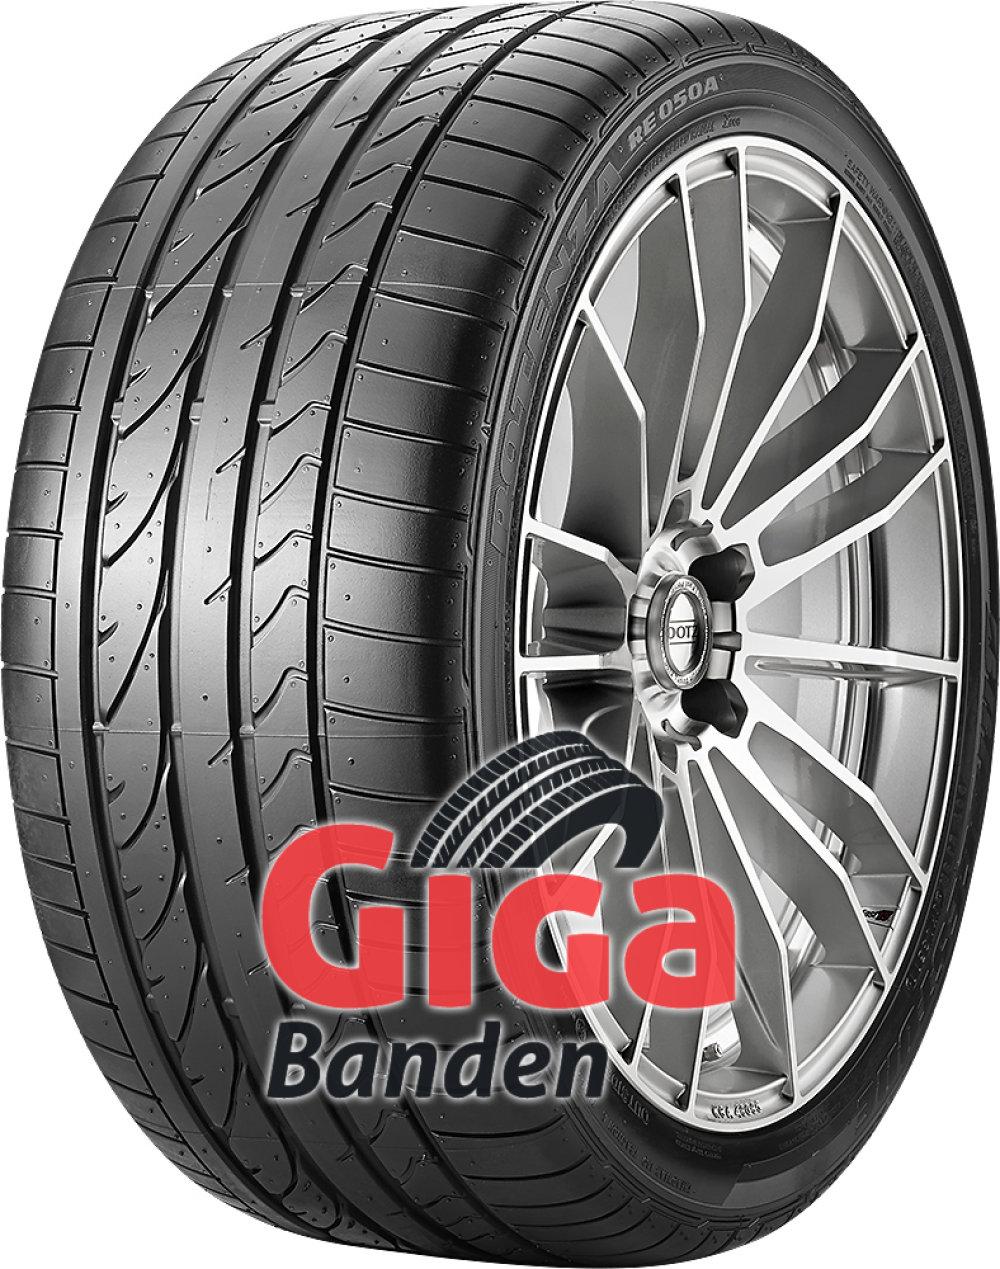 Bridgestone Potenza RE 050 A Pole Position ( 285/35 ZR19 (99Y) dubbele markering 99ZR, met velgrandbescherming (MFS) )